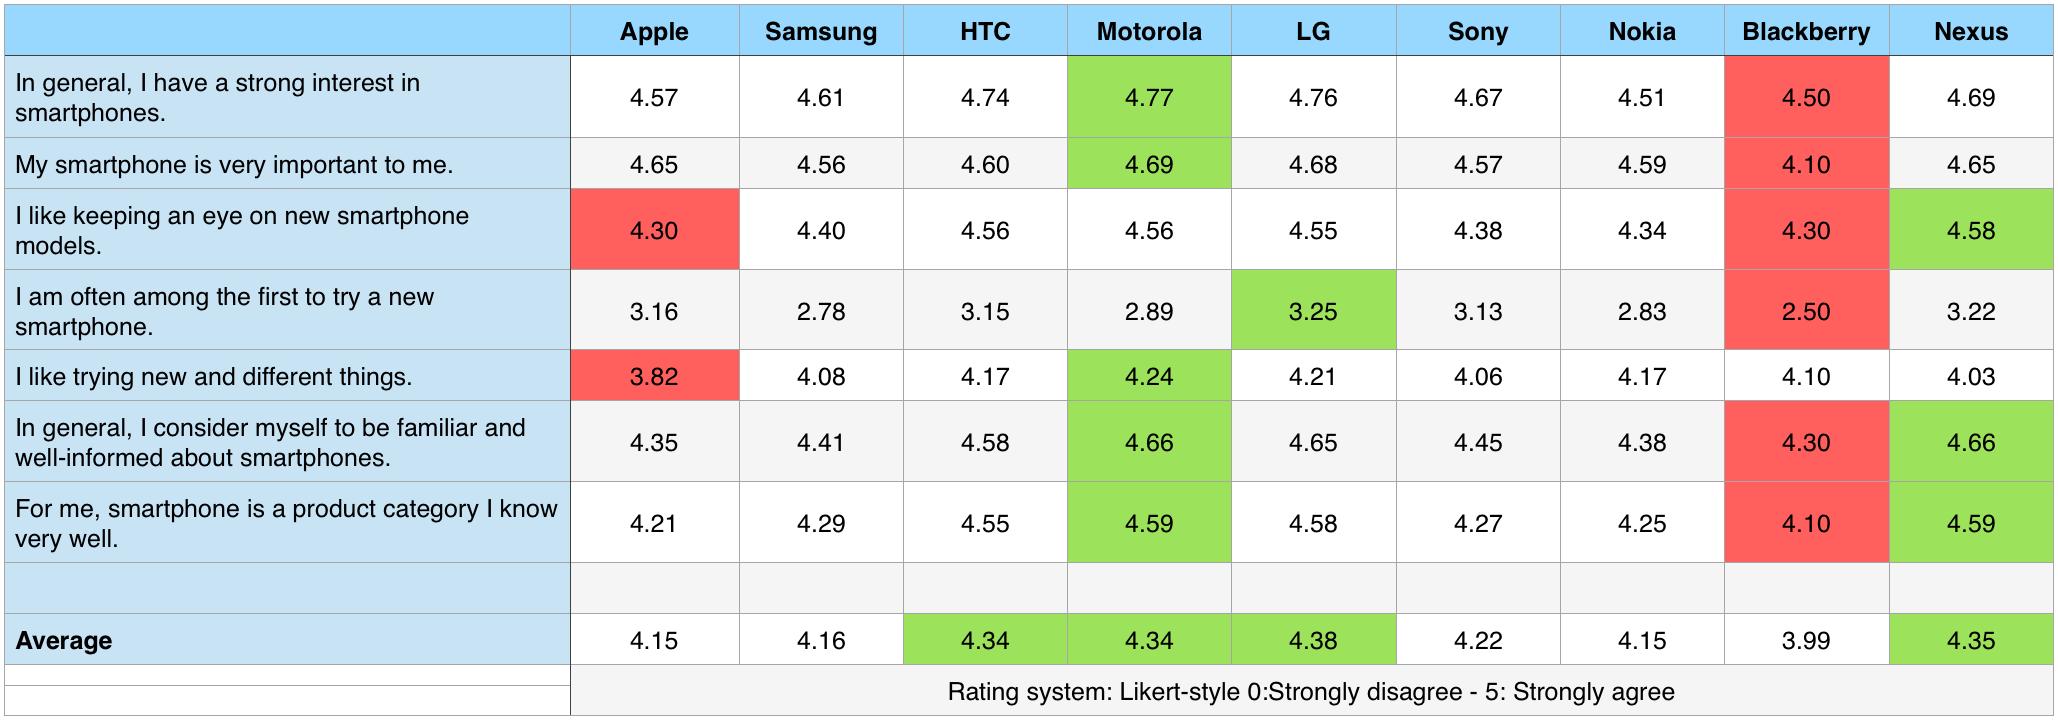 Smartphone category involvement